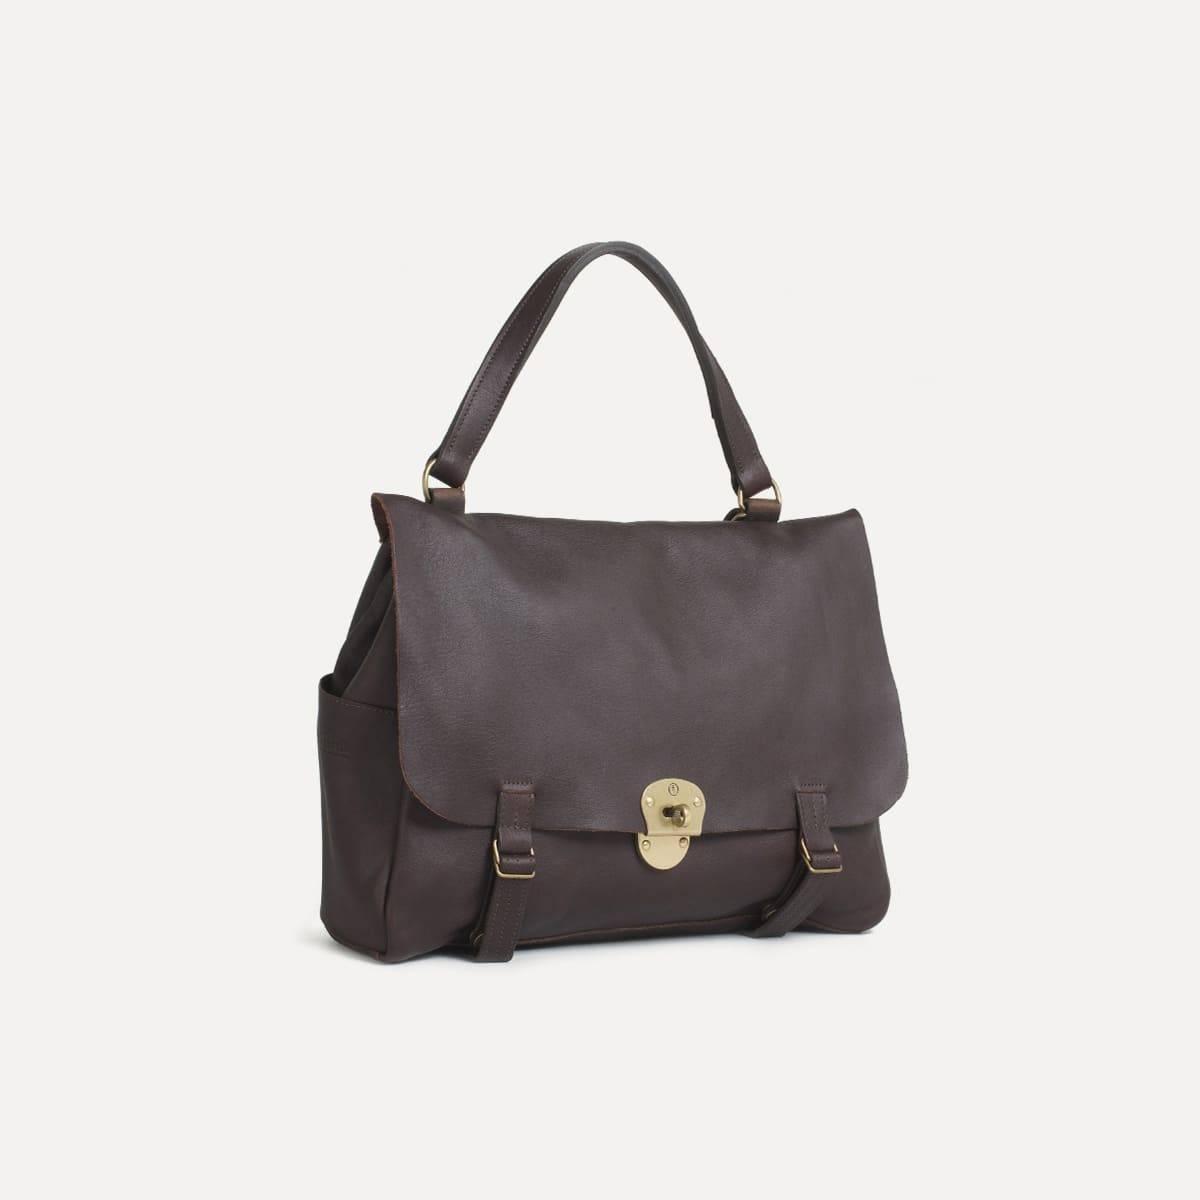 Coline bag M - Peat (image n°4)